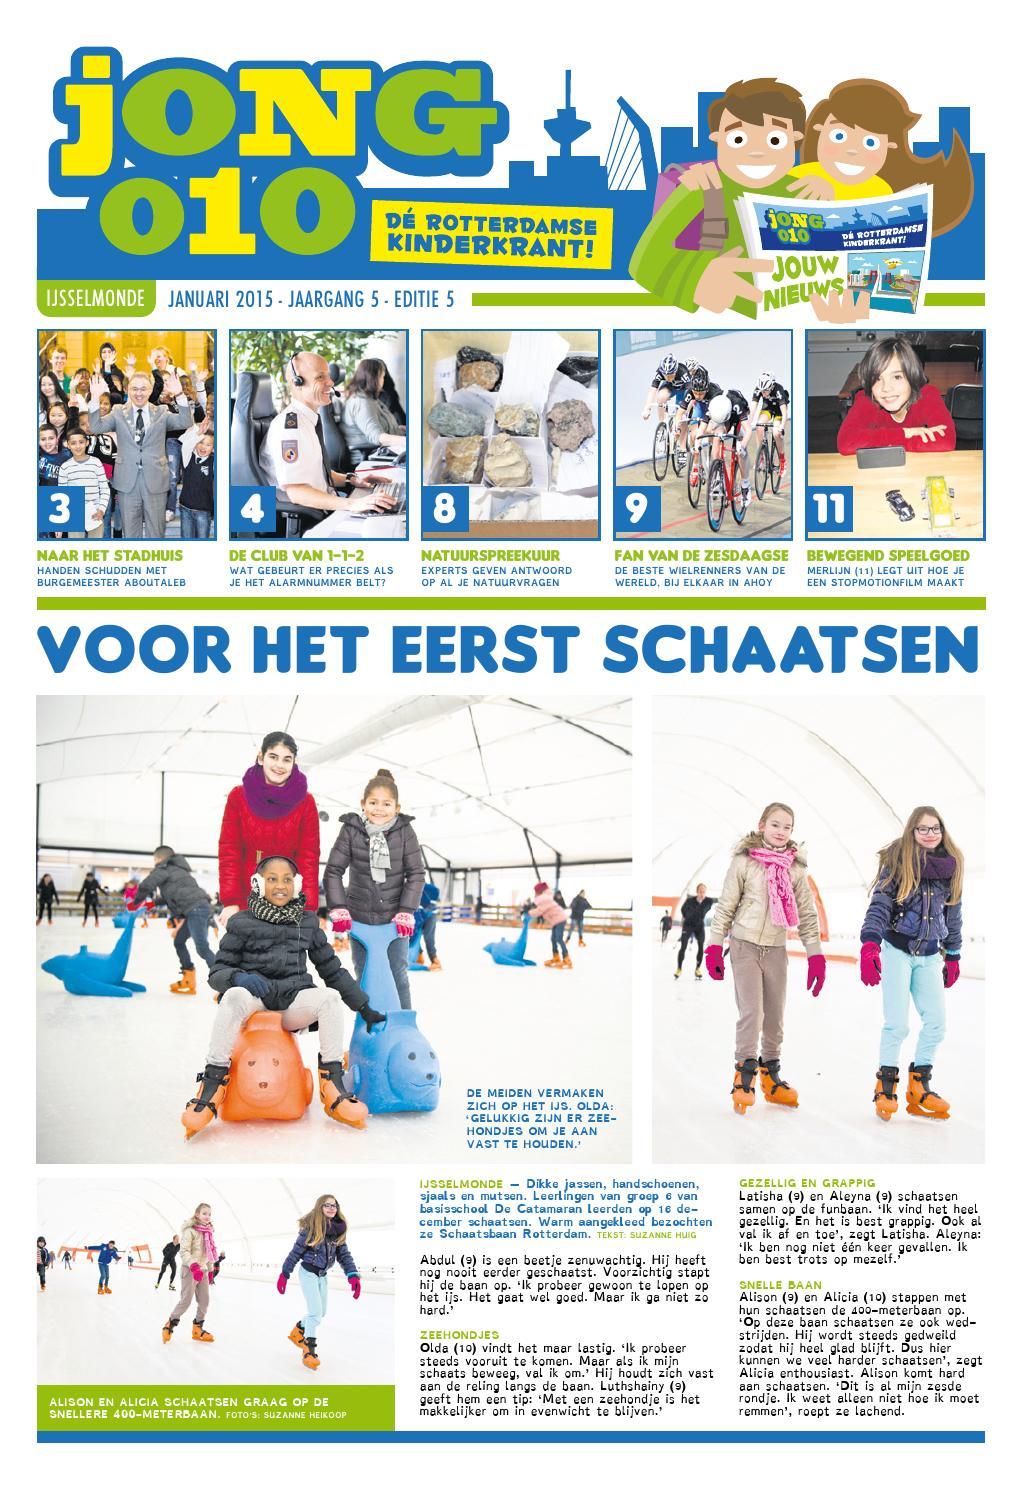 fef4e5719e3 JONG010 JANUARI 2015 IJSSELMONDE by Jong010, dé Rotterdamse kinderkrant -  issuu